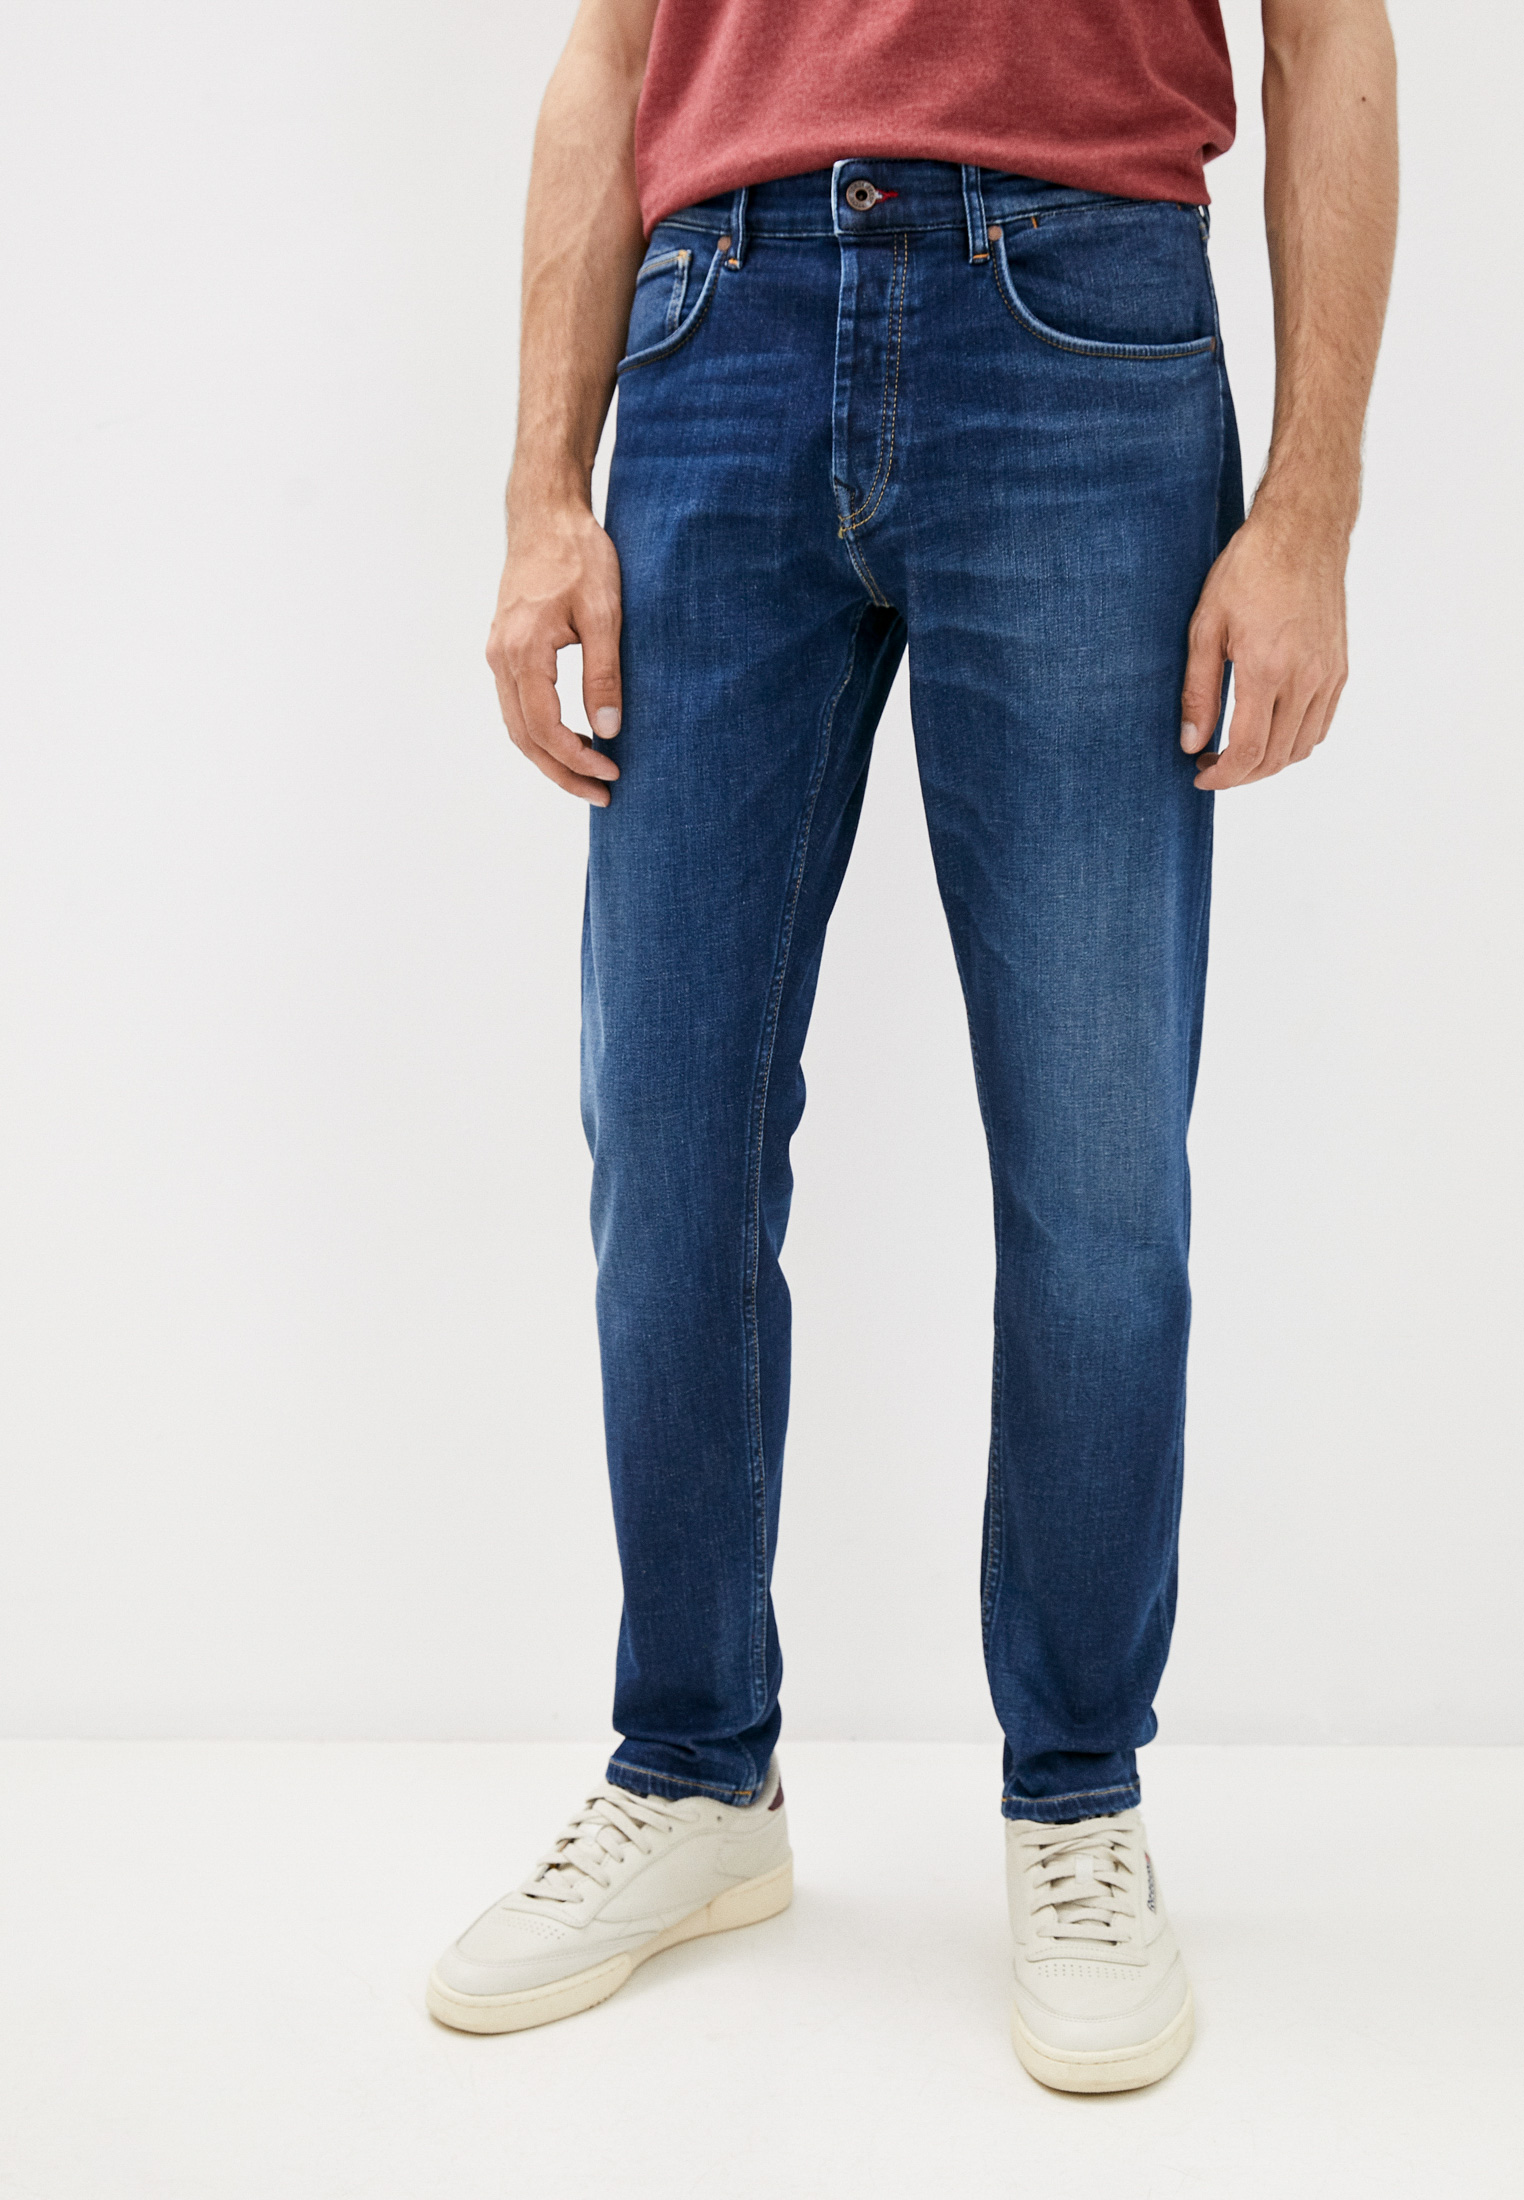 Зауженные джинсы Pepe Jeans (Пепе Джинс) PM205832DI0